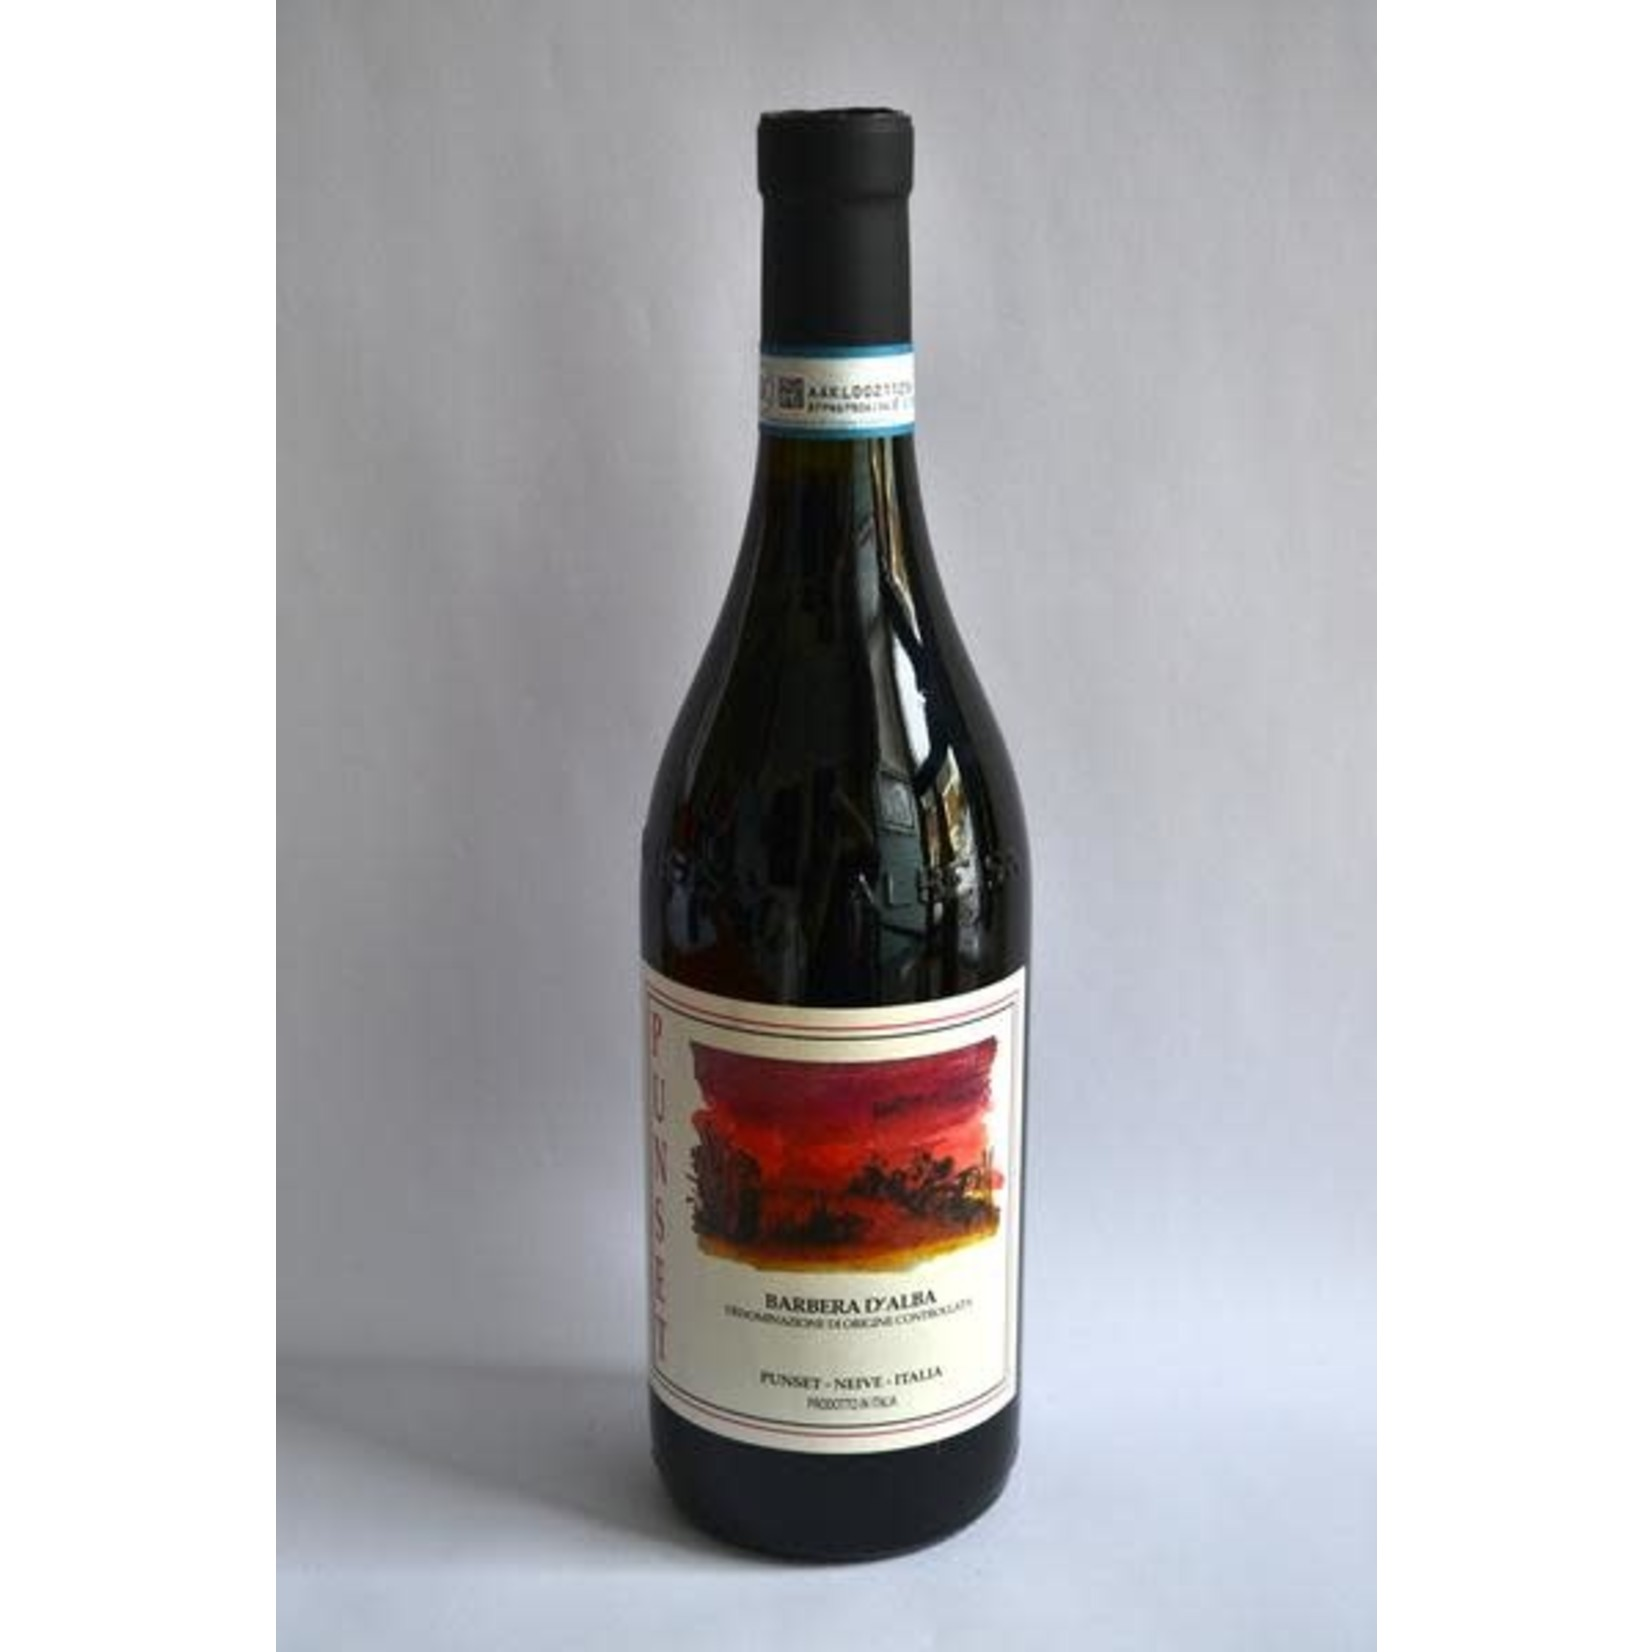 Wine Punset Barbera d'Alba 2019